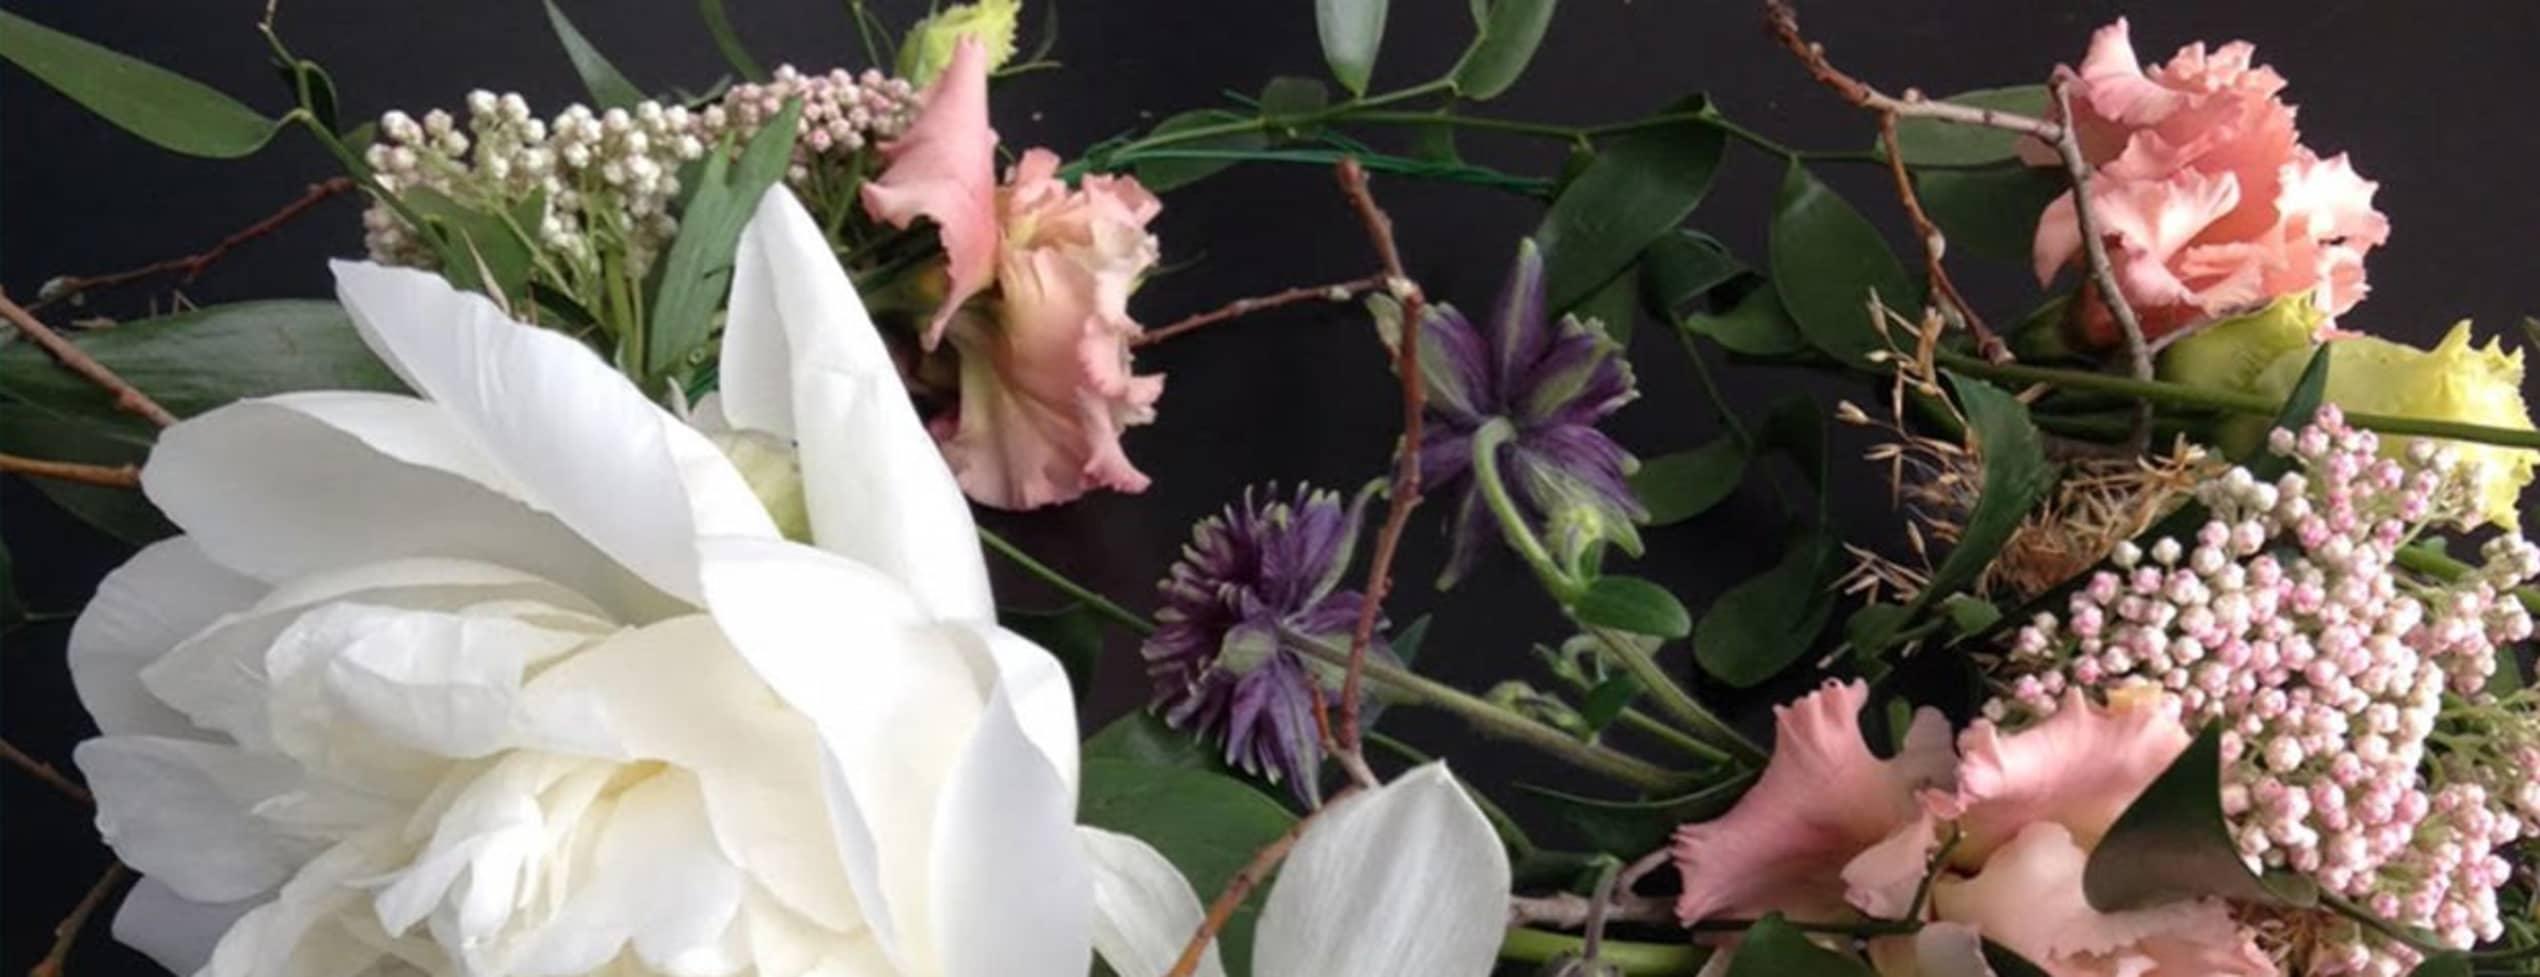 Create a lovely midsummer wreath